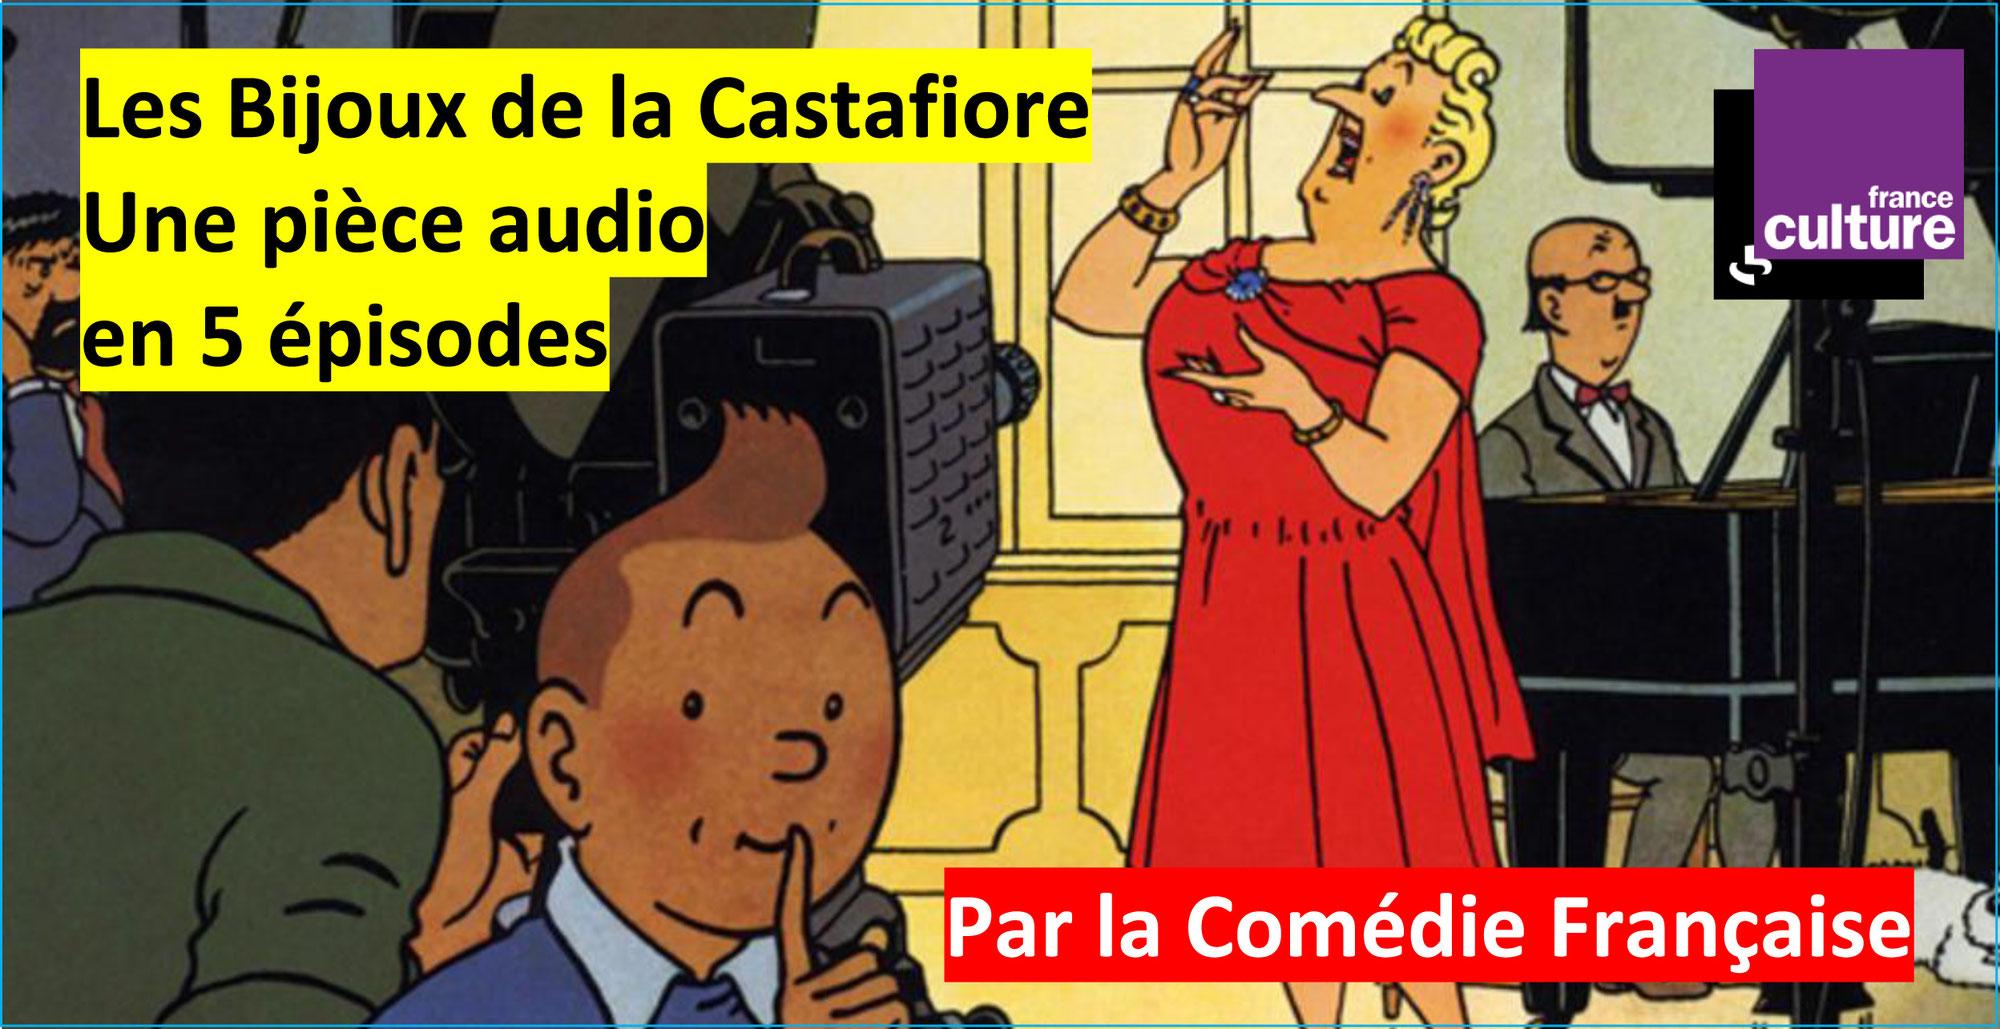 TINTIN - LES BIJOUX DE LA CASTAFIORE: une adaptation audio-théâtre (FRANCE CULTURE)